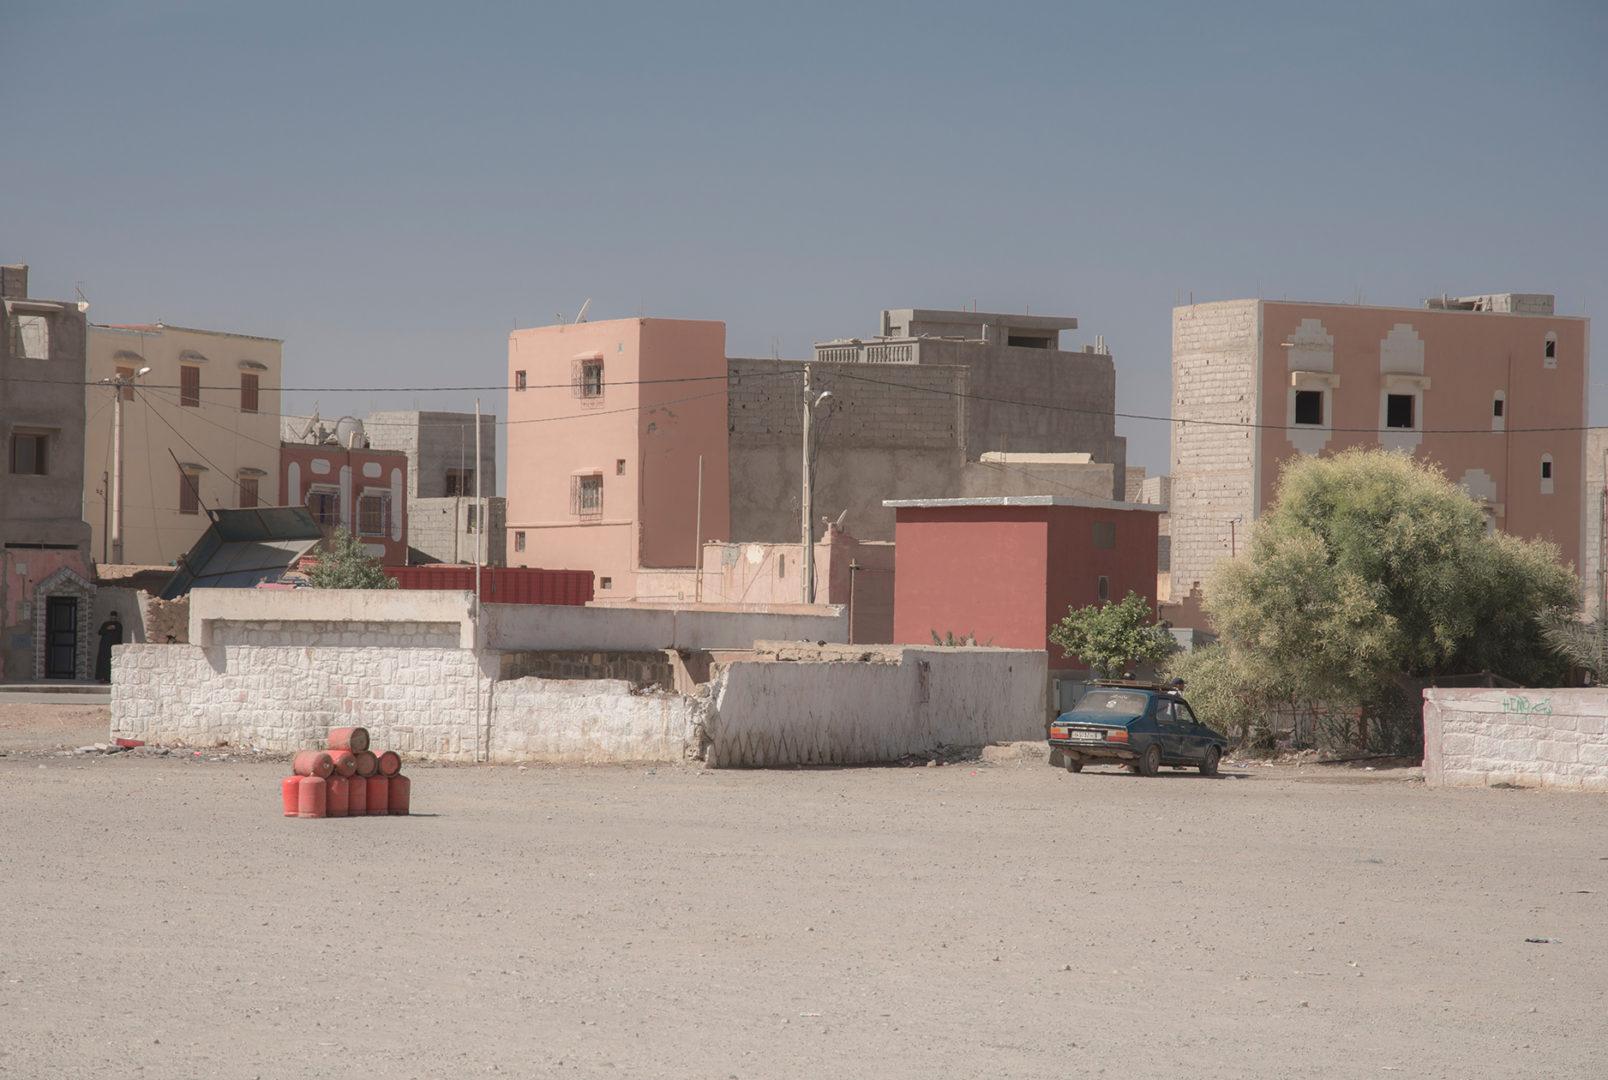 Sidi Mokhtar Morocco